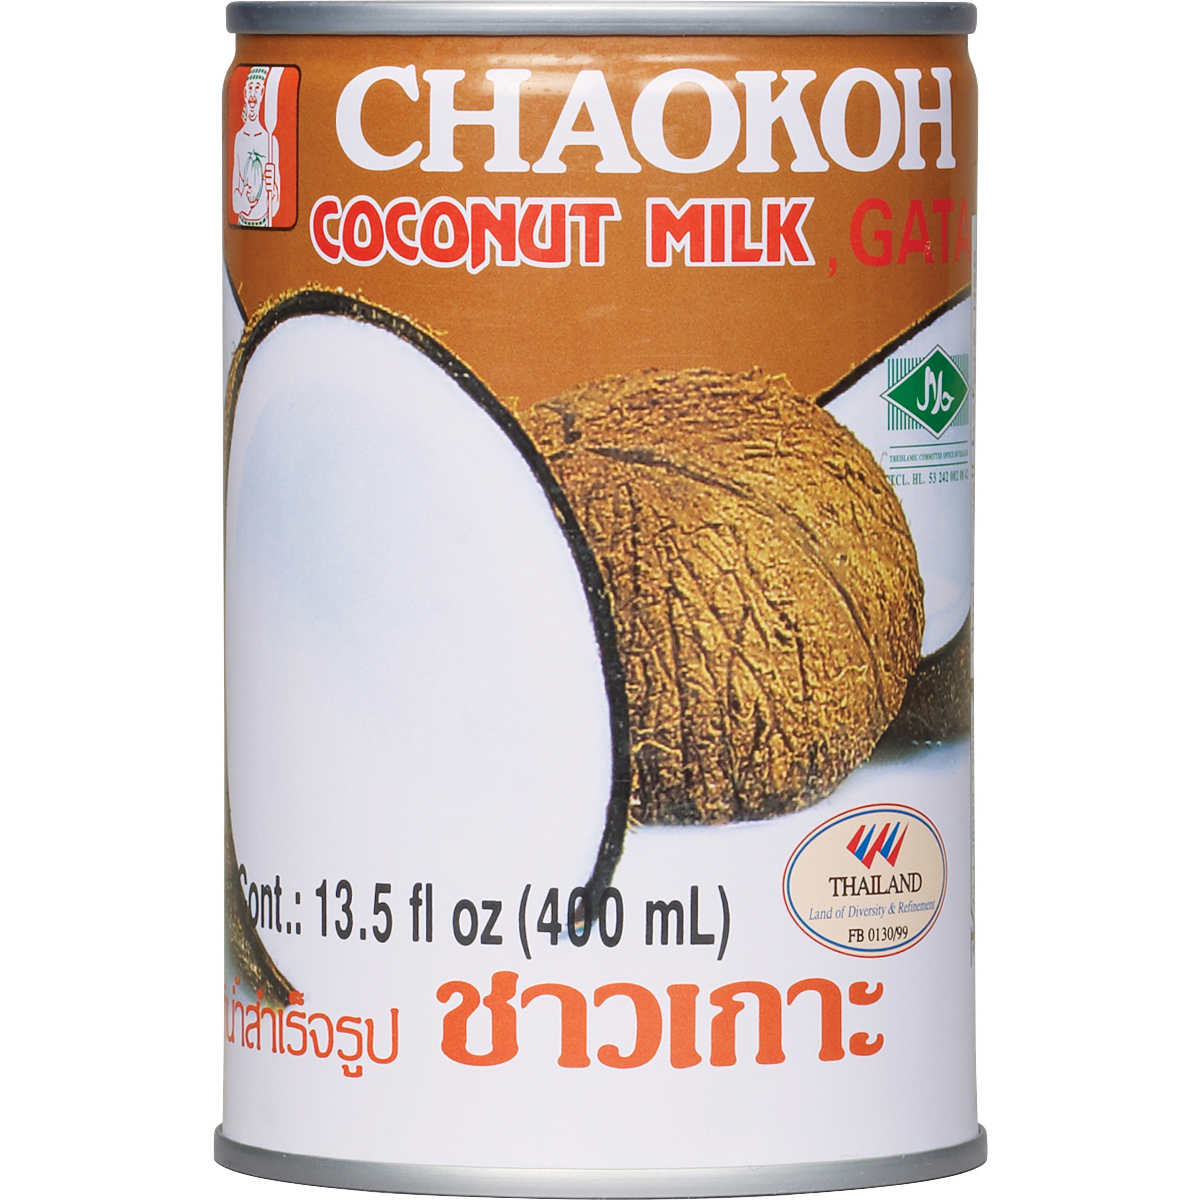 Image result for coconut milk images